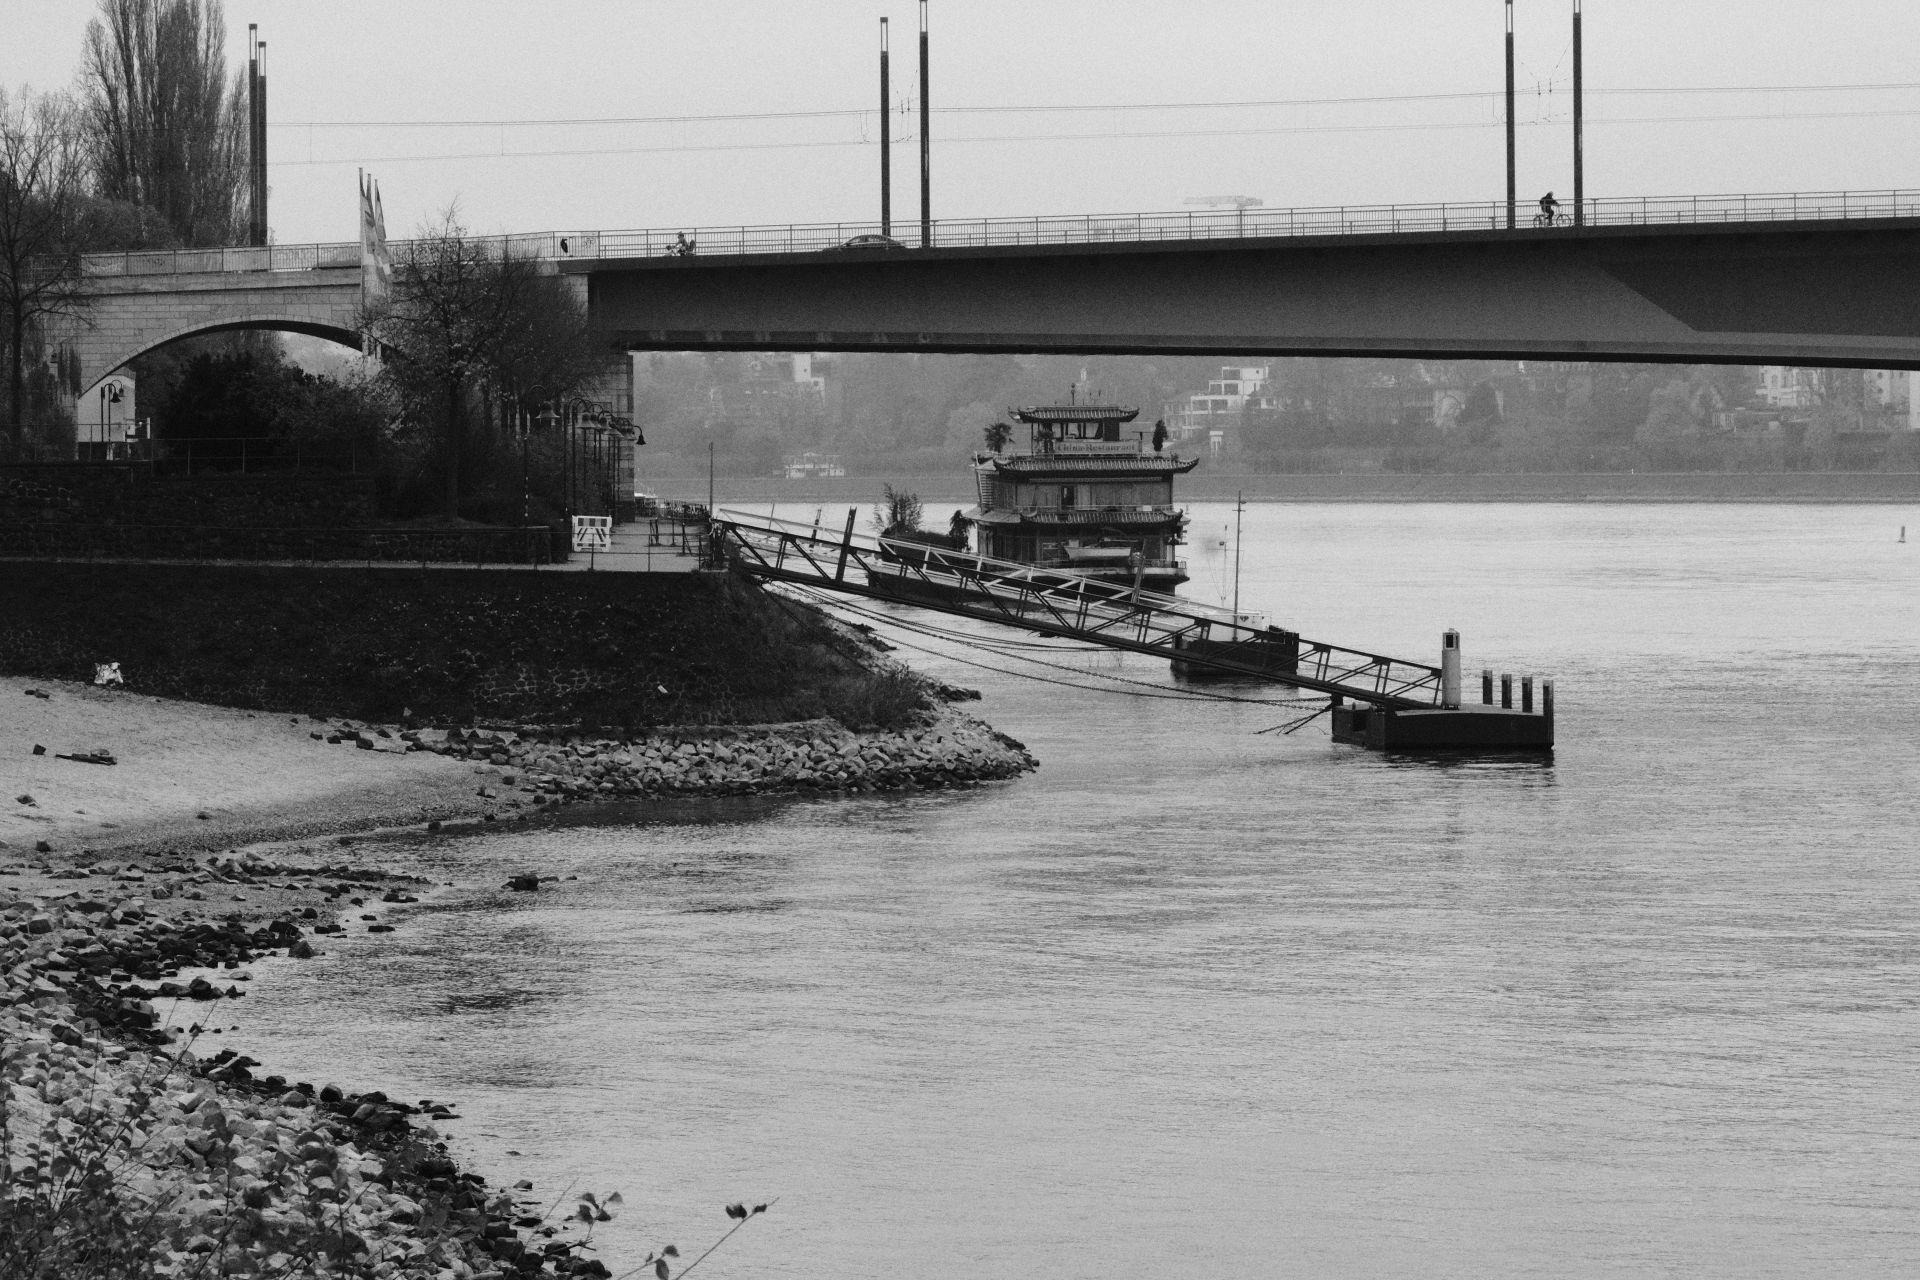 Kennedybrücke f/16 1/500sec ISO-5000 93.2mm